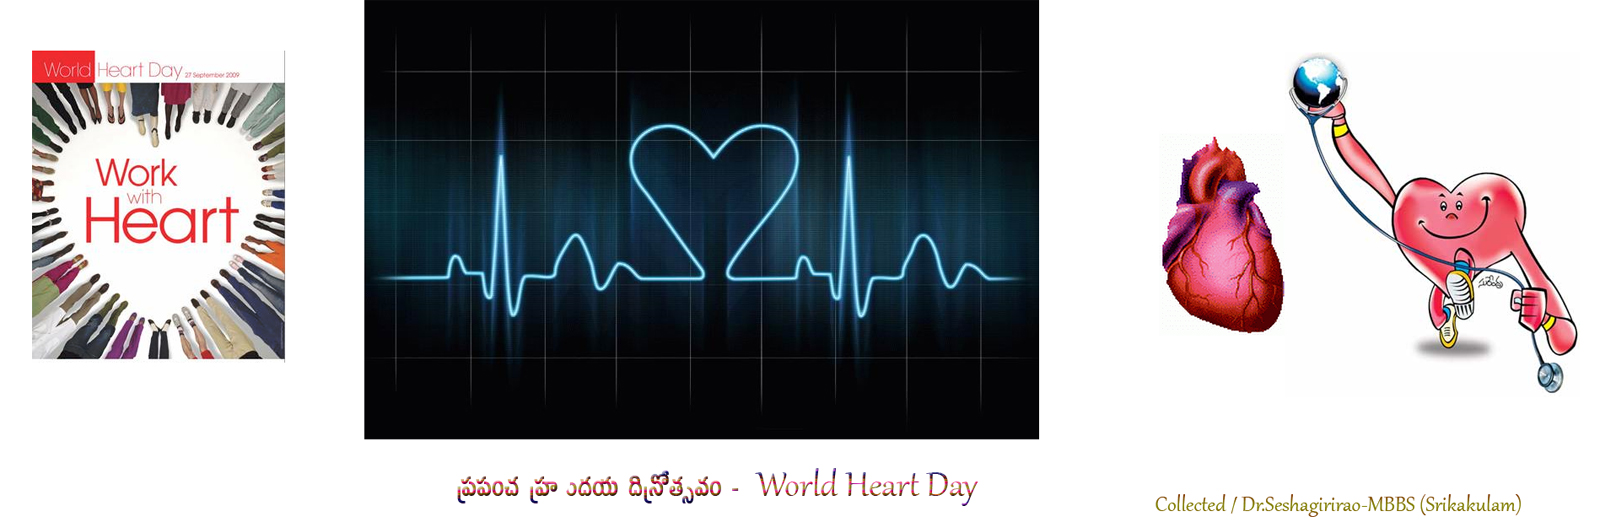 http://3.bp.blogspot.com/_pYzq4zxbFTY/TKaYKUwdrlI/AAAAAAAAAmE/H_GTYI6mZFc/s1600/Heart+Day+celebrations.jpg